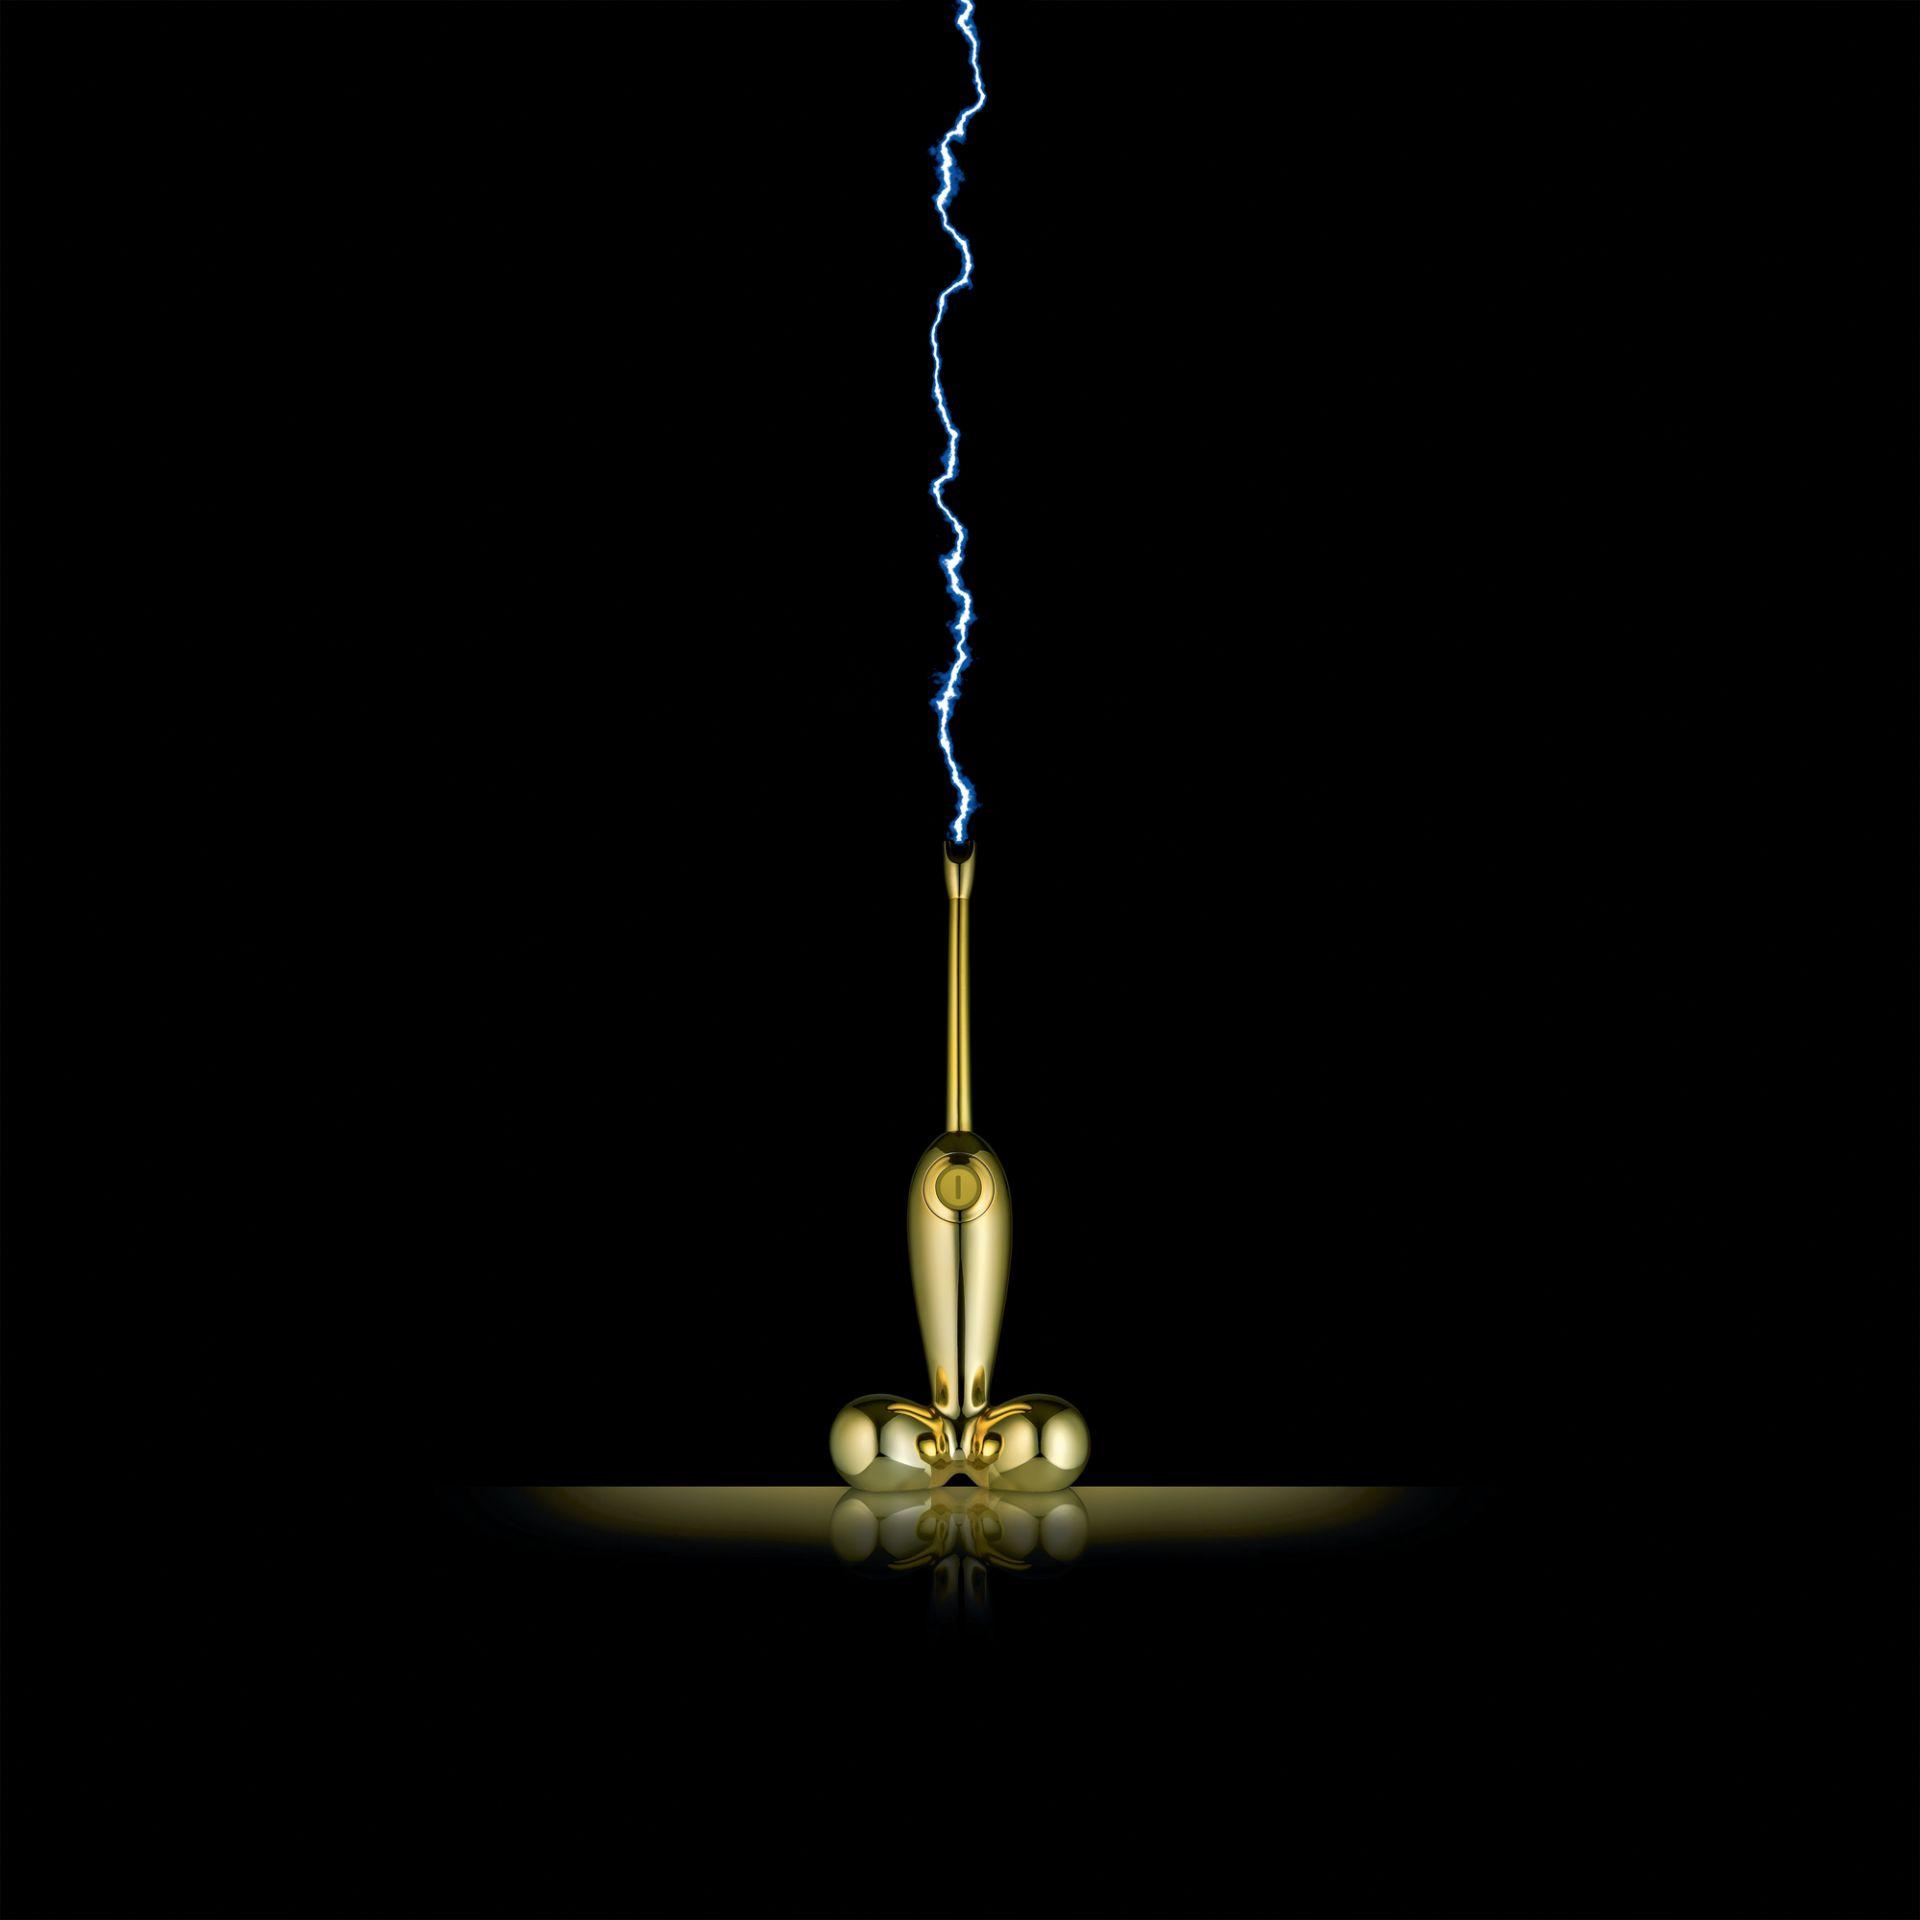 Firebird 2.0 Electric Arc Lighter Black Alessi